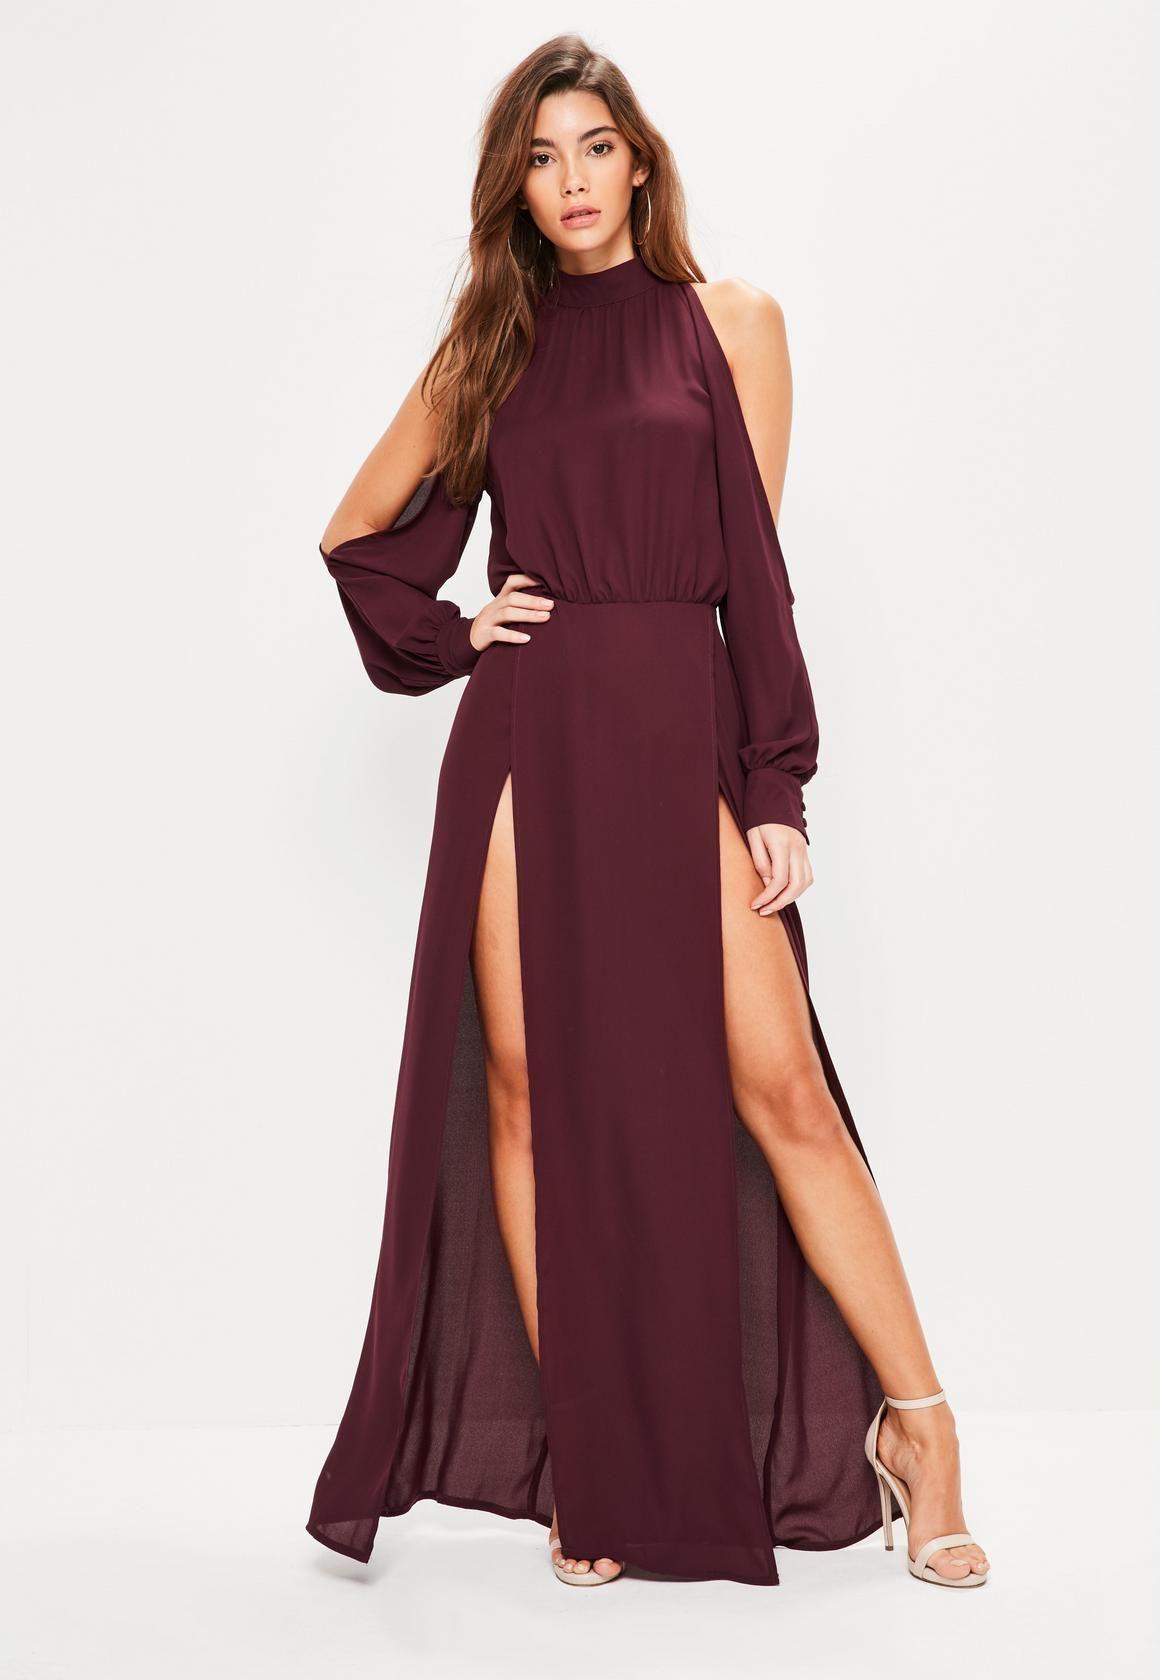 Missguided Burgundy Split Front And Sleeve Maxi Dress Vestiti Uomini Alla Moda Moda [ 1680 x 1160 Pixel ]